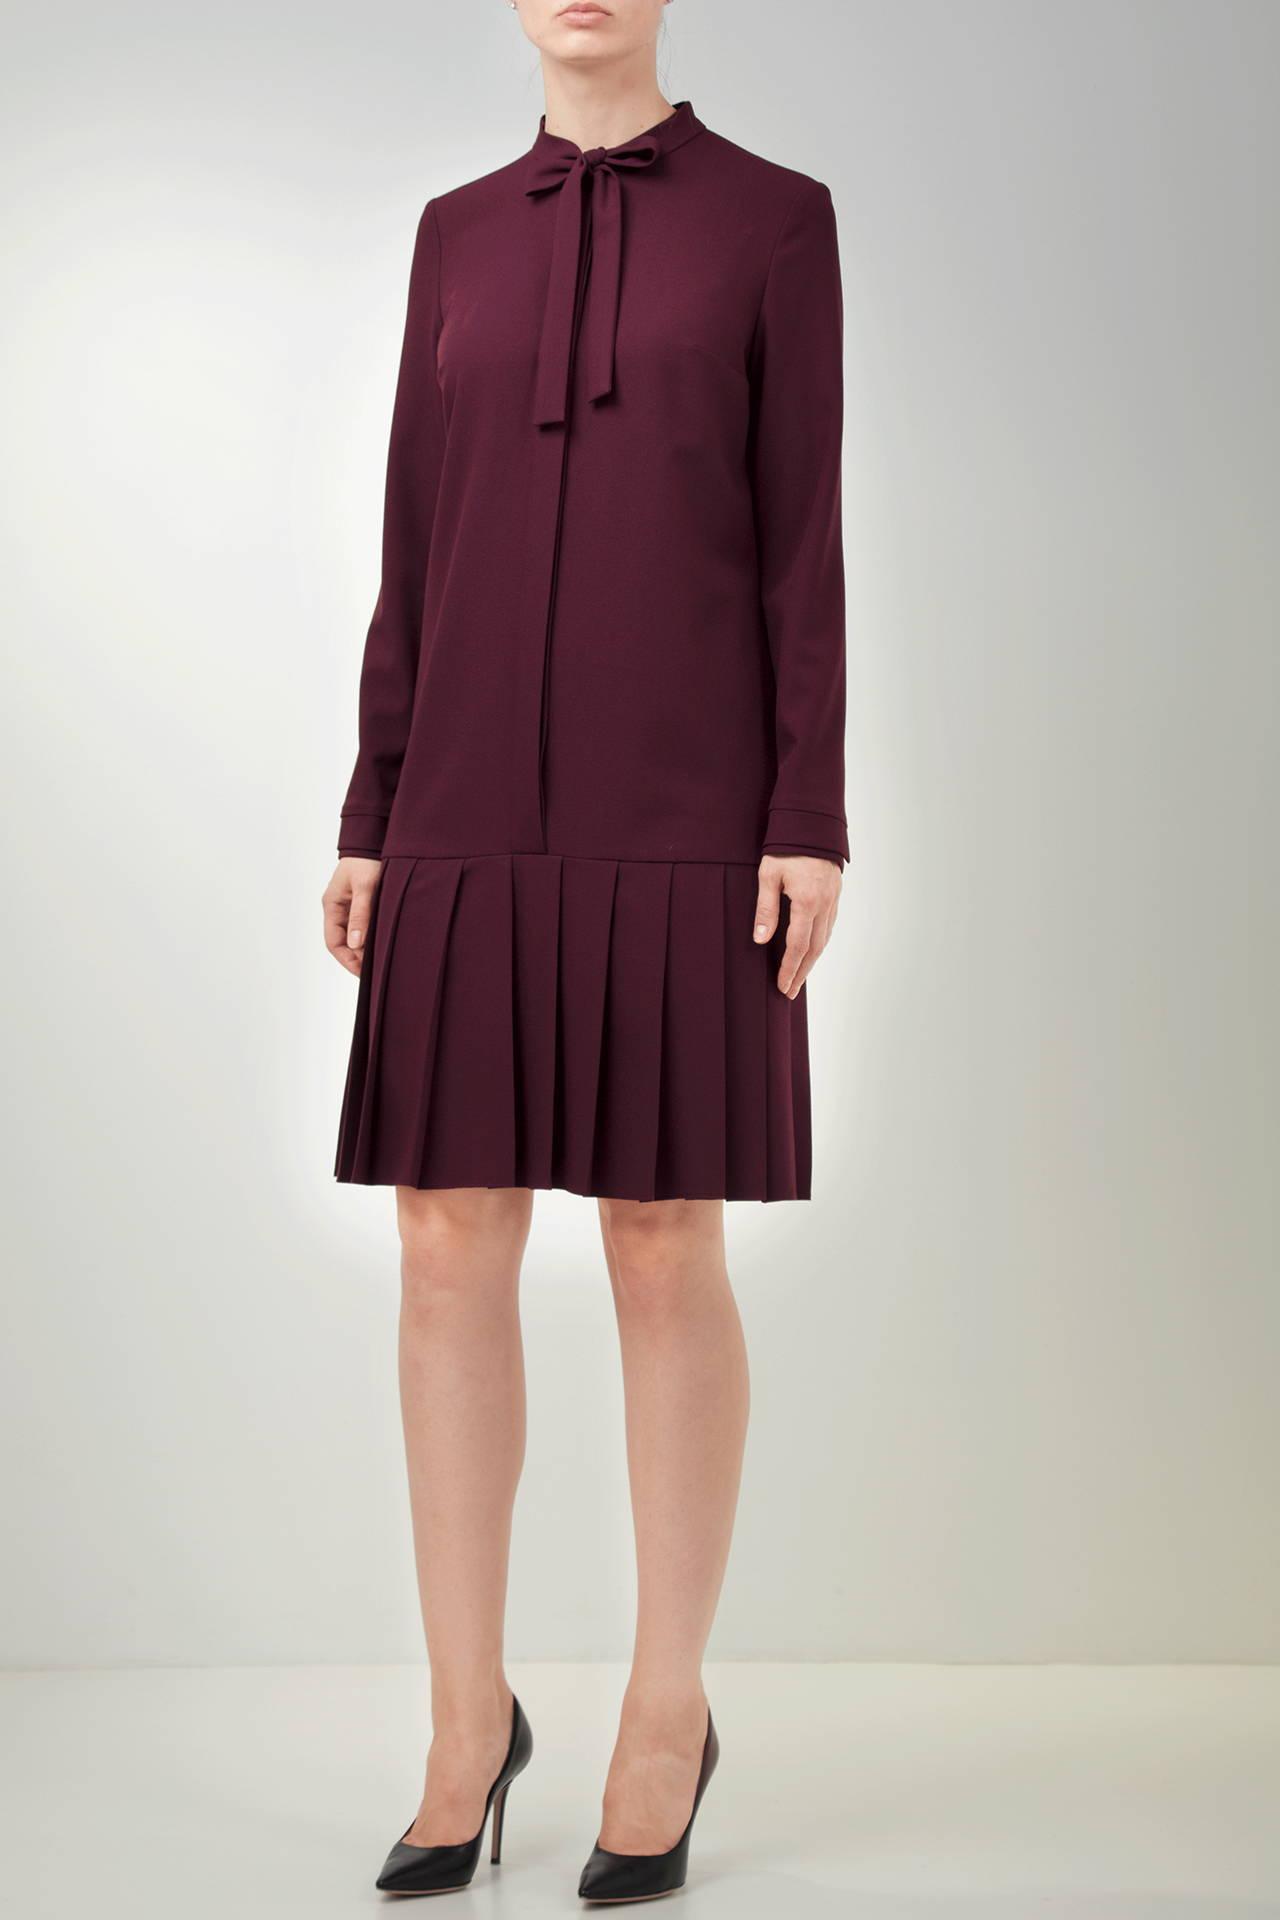 PLEATED BURGUNDY VISCOSE-BLEND CREPE DRESS